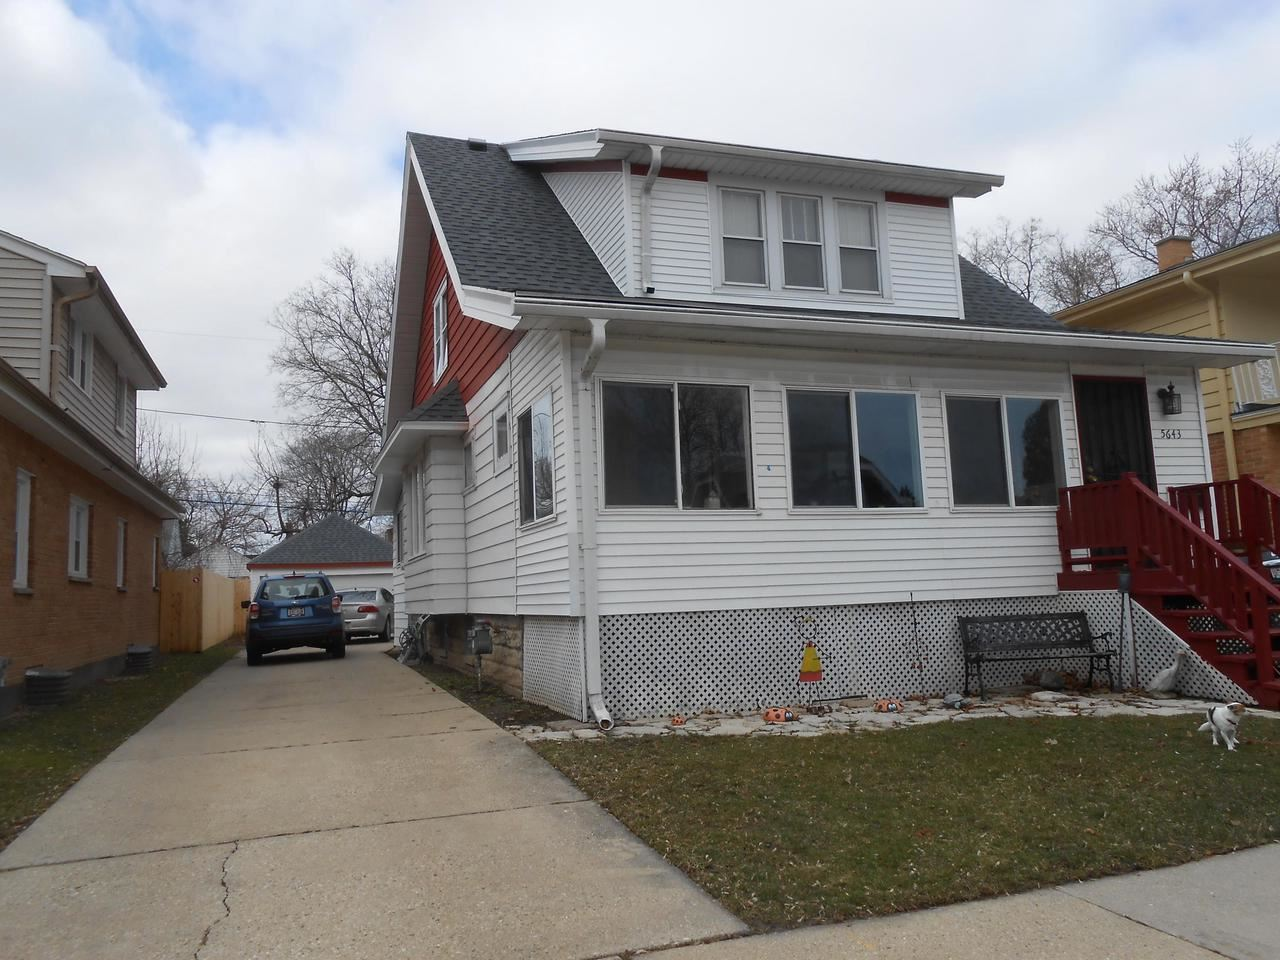 5643 N 39th St, Milwaukee, WI 53209 - MLS#: 1685108